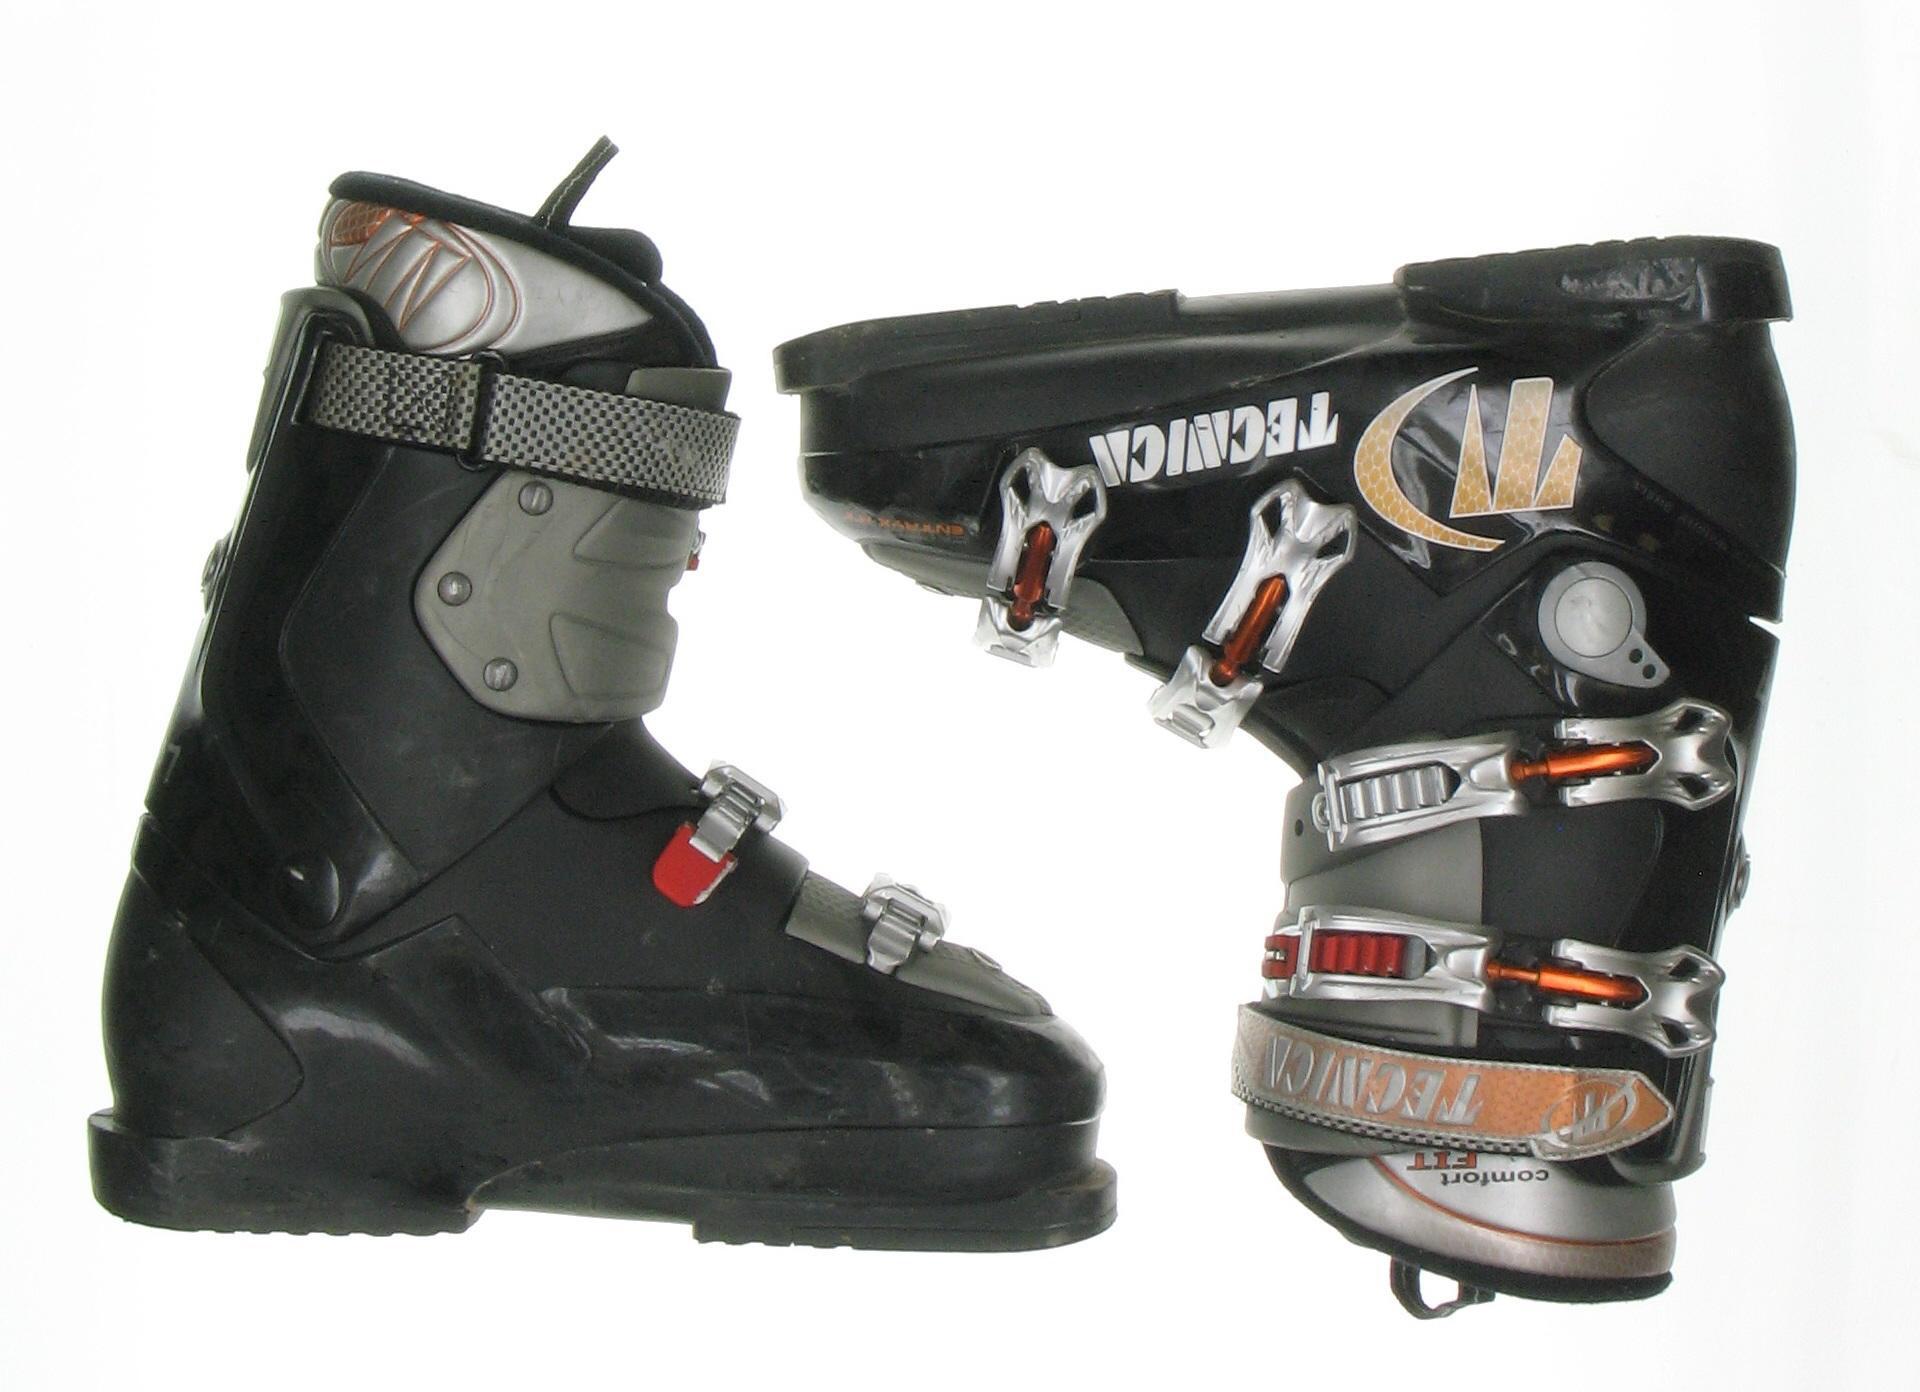 size 13 mens ski boots 28 images size 13 mens ski